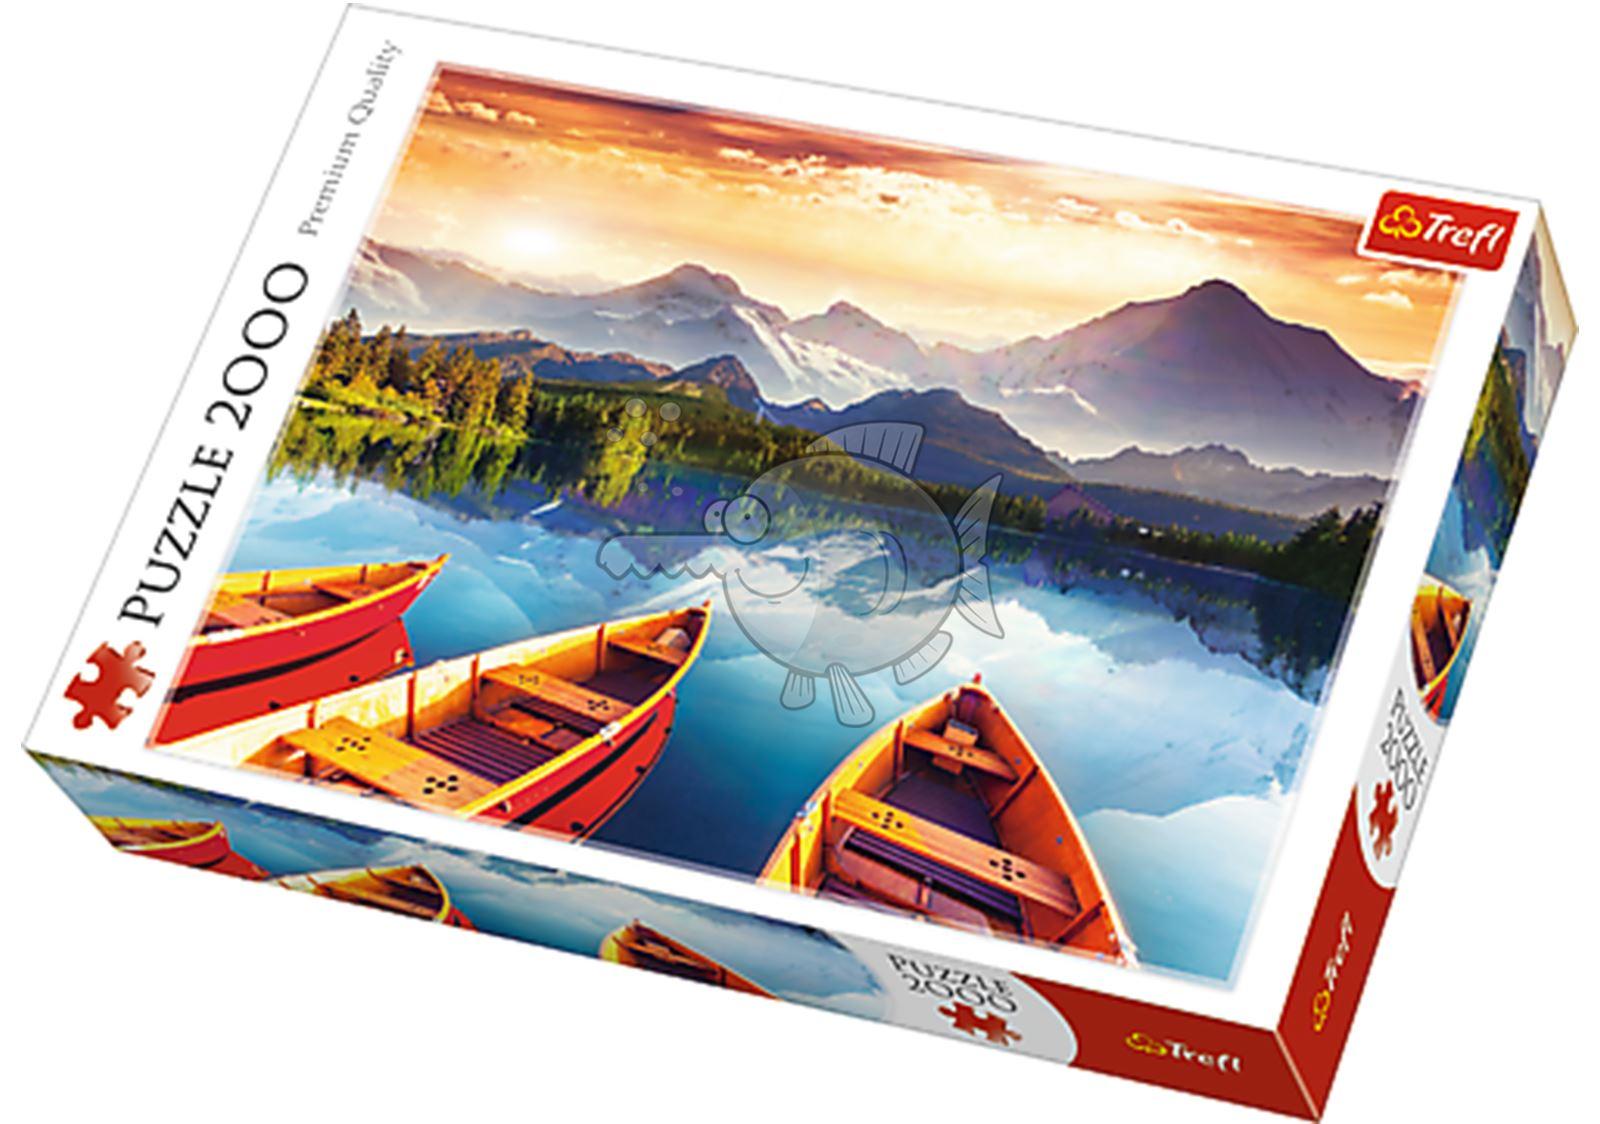 Trefl-300-500-1000-1500-2000-3000-4000-6000-Piece-Jigsaw-Puzzle-Landscapes-City thumbnail 93